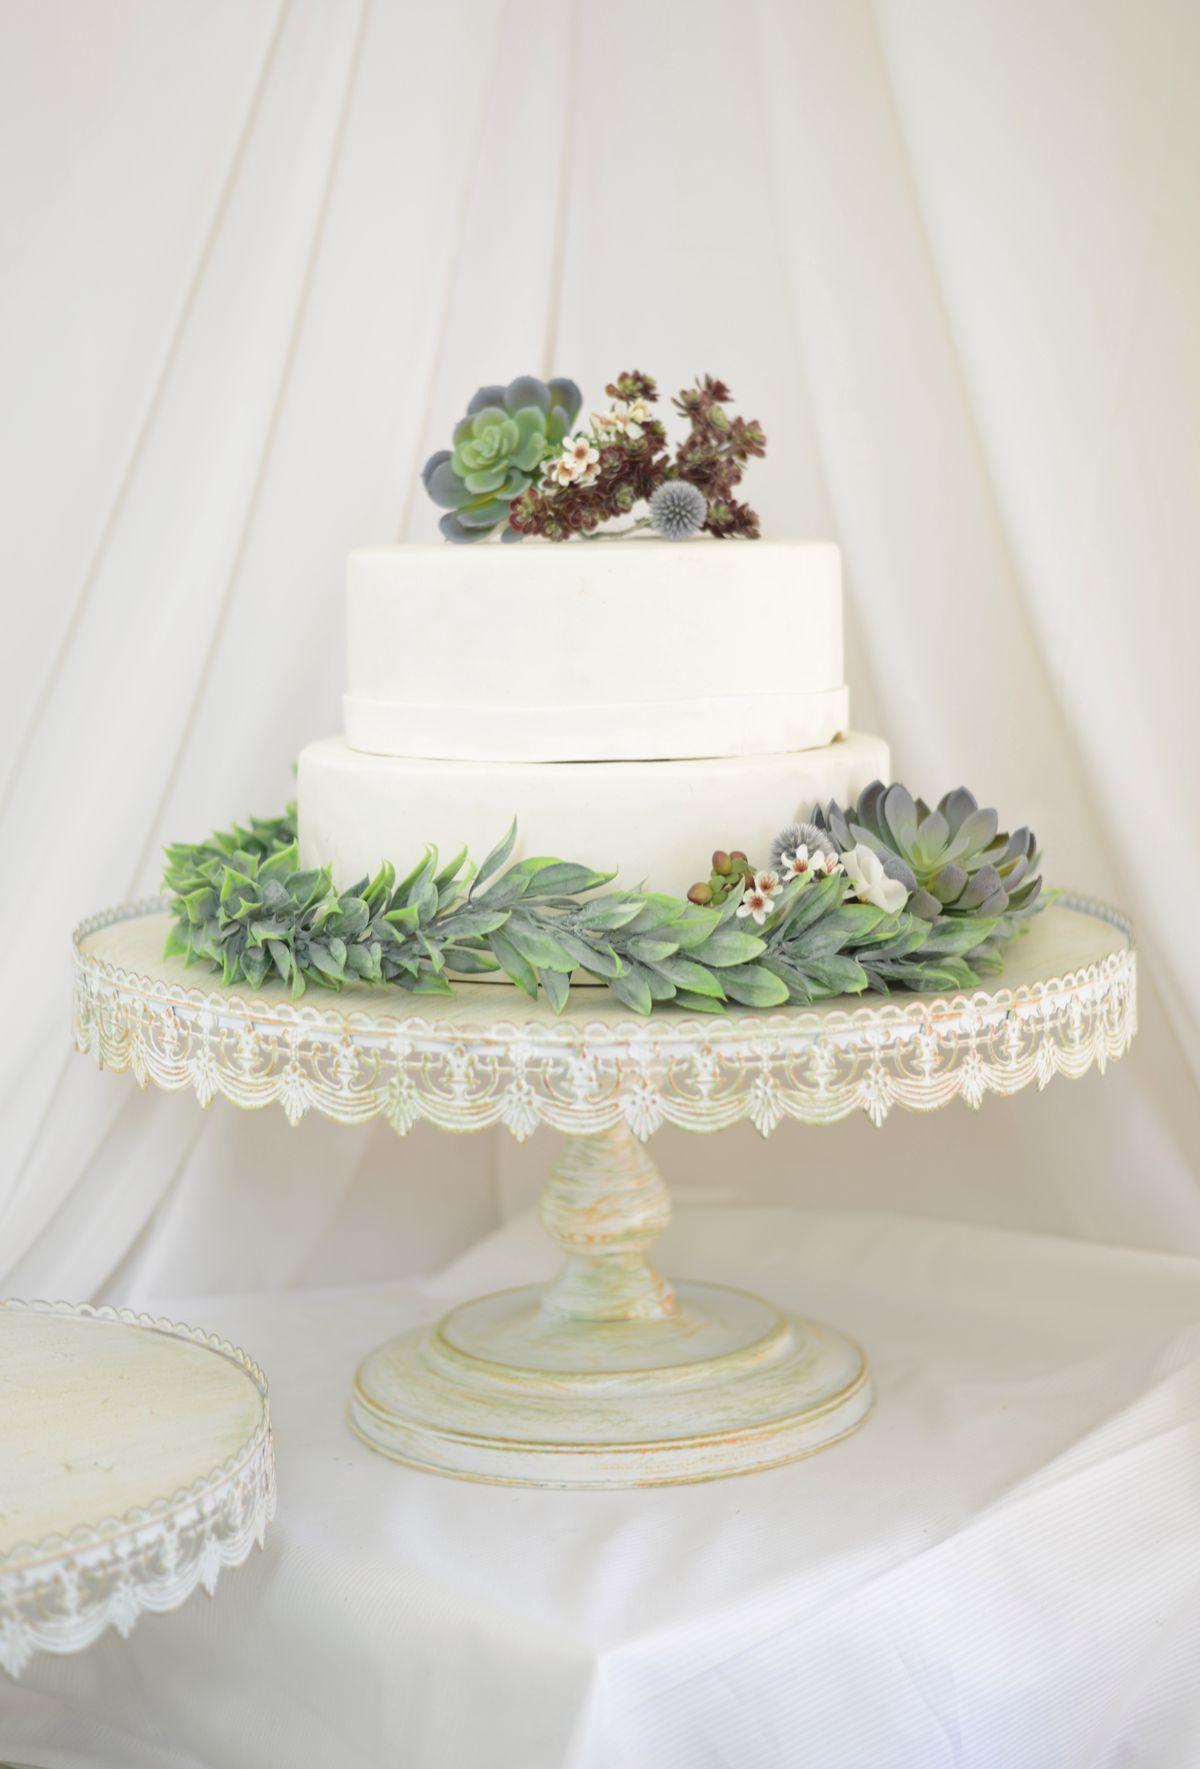 Vintage Metal Cake Stand White 22in 39.99 Metal cake